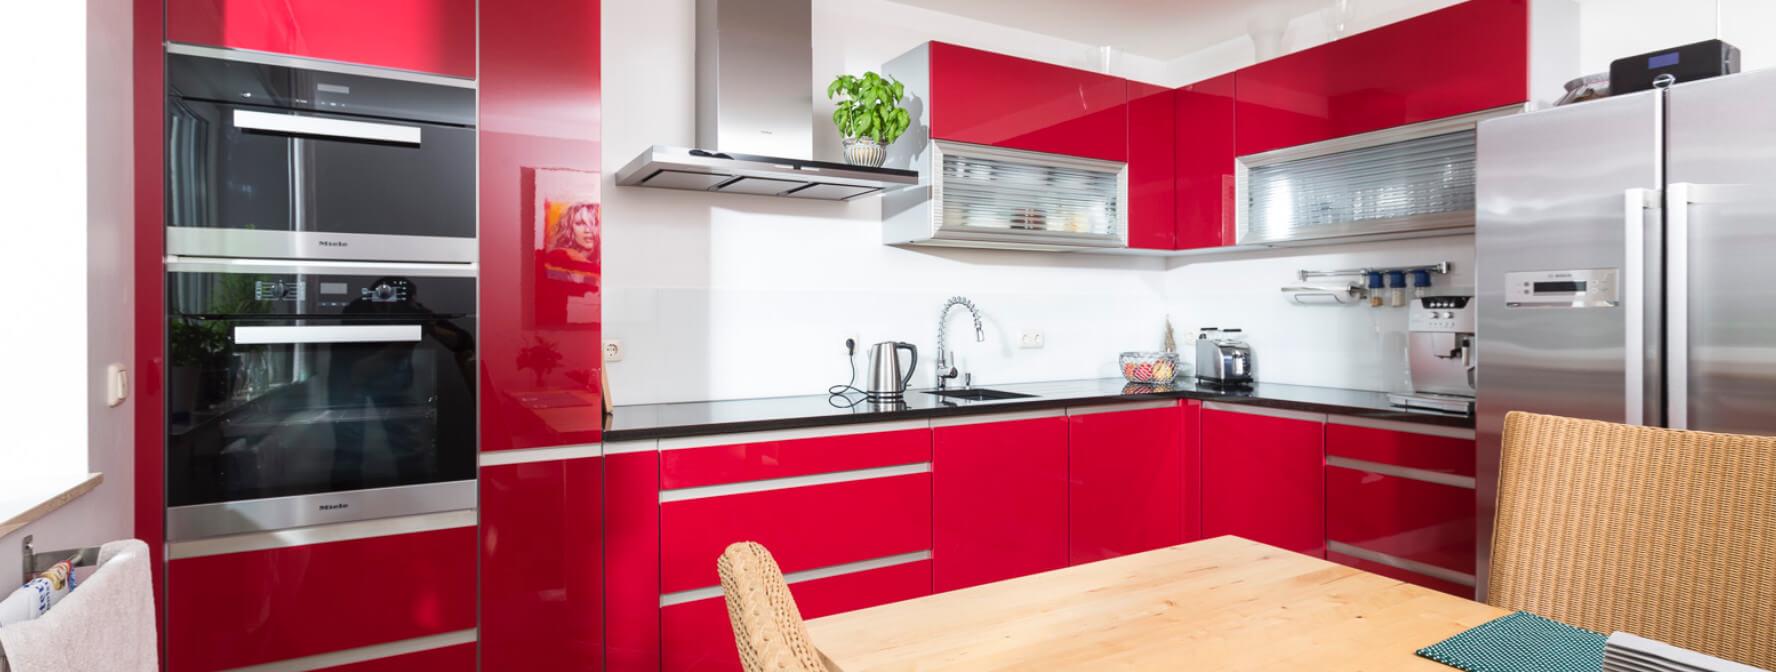 Full Size of Rückwand Küche Ikea Nischenrückwand Küche Naber Rückwand Küche Auf Fliesen Nischenrückwand Küche Glas Nolte Küche Nischenrückwand Küche